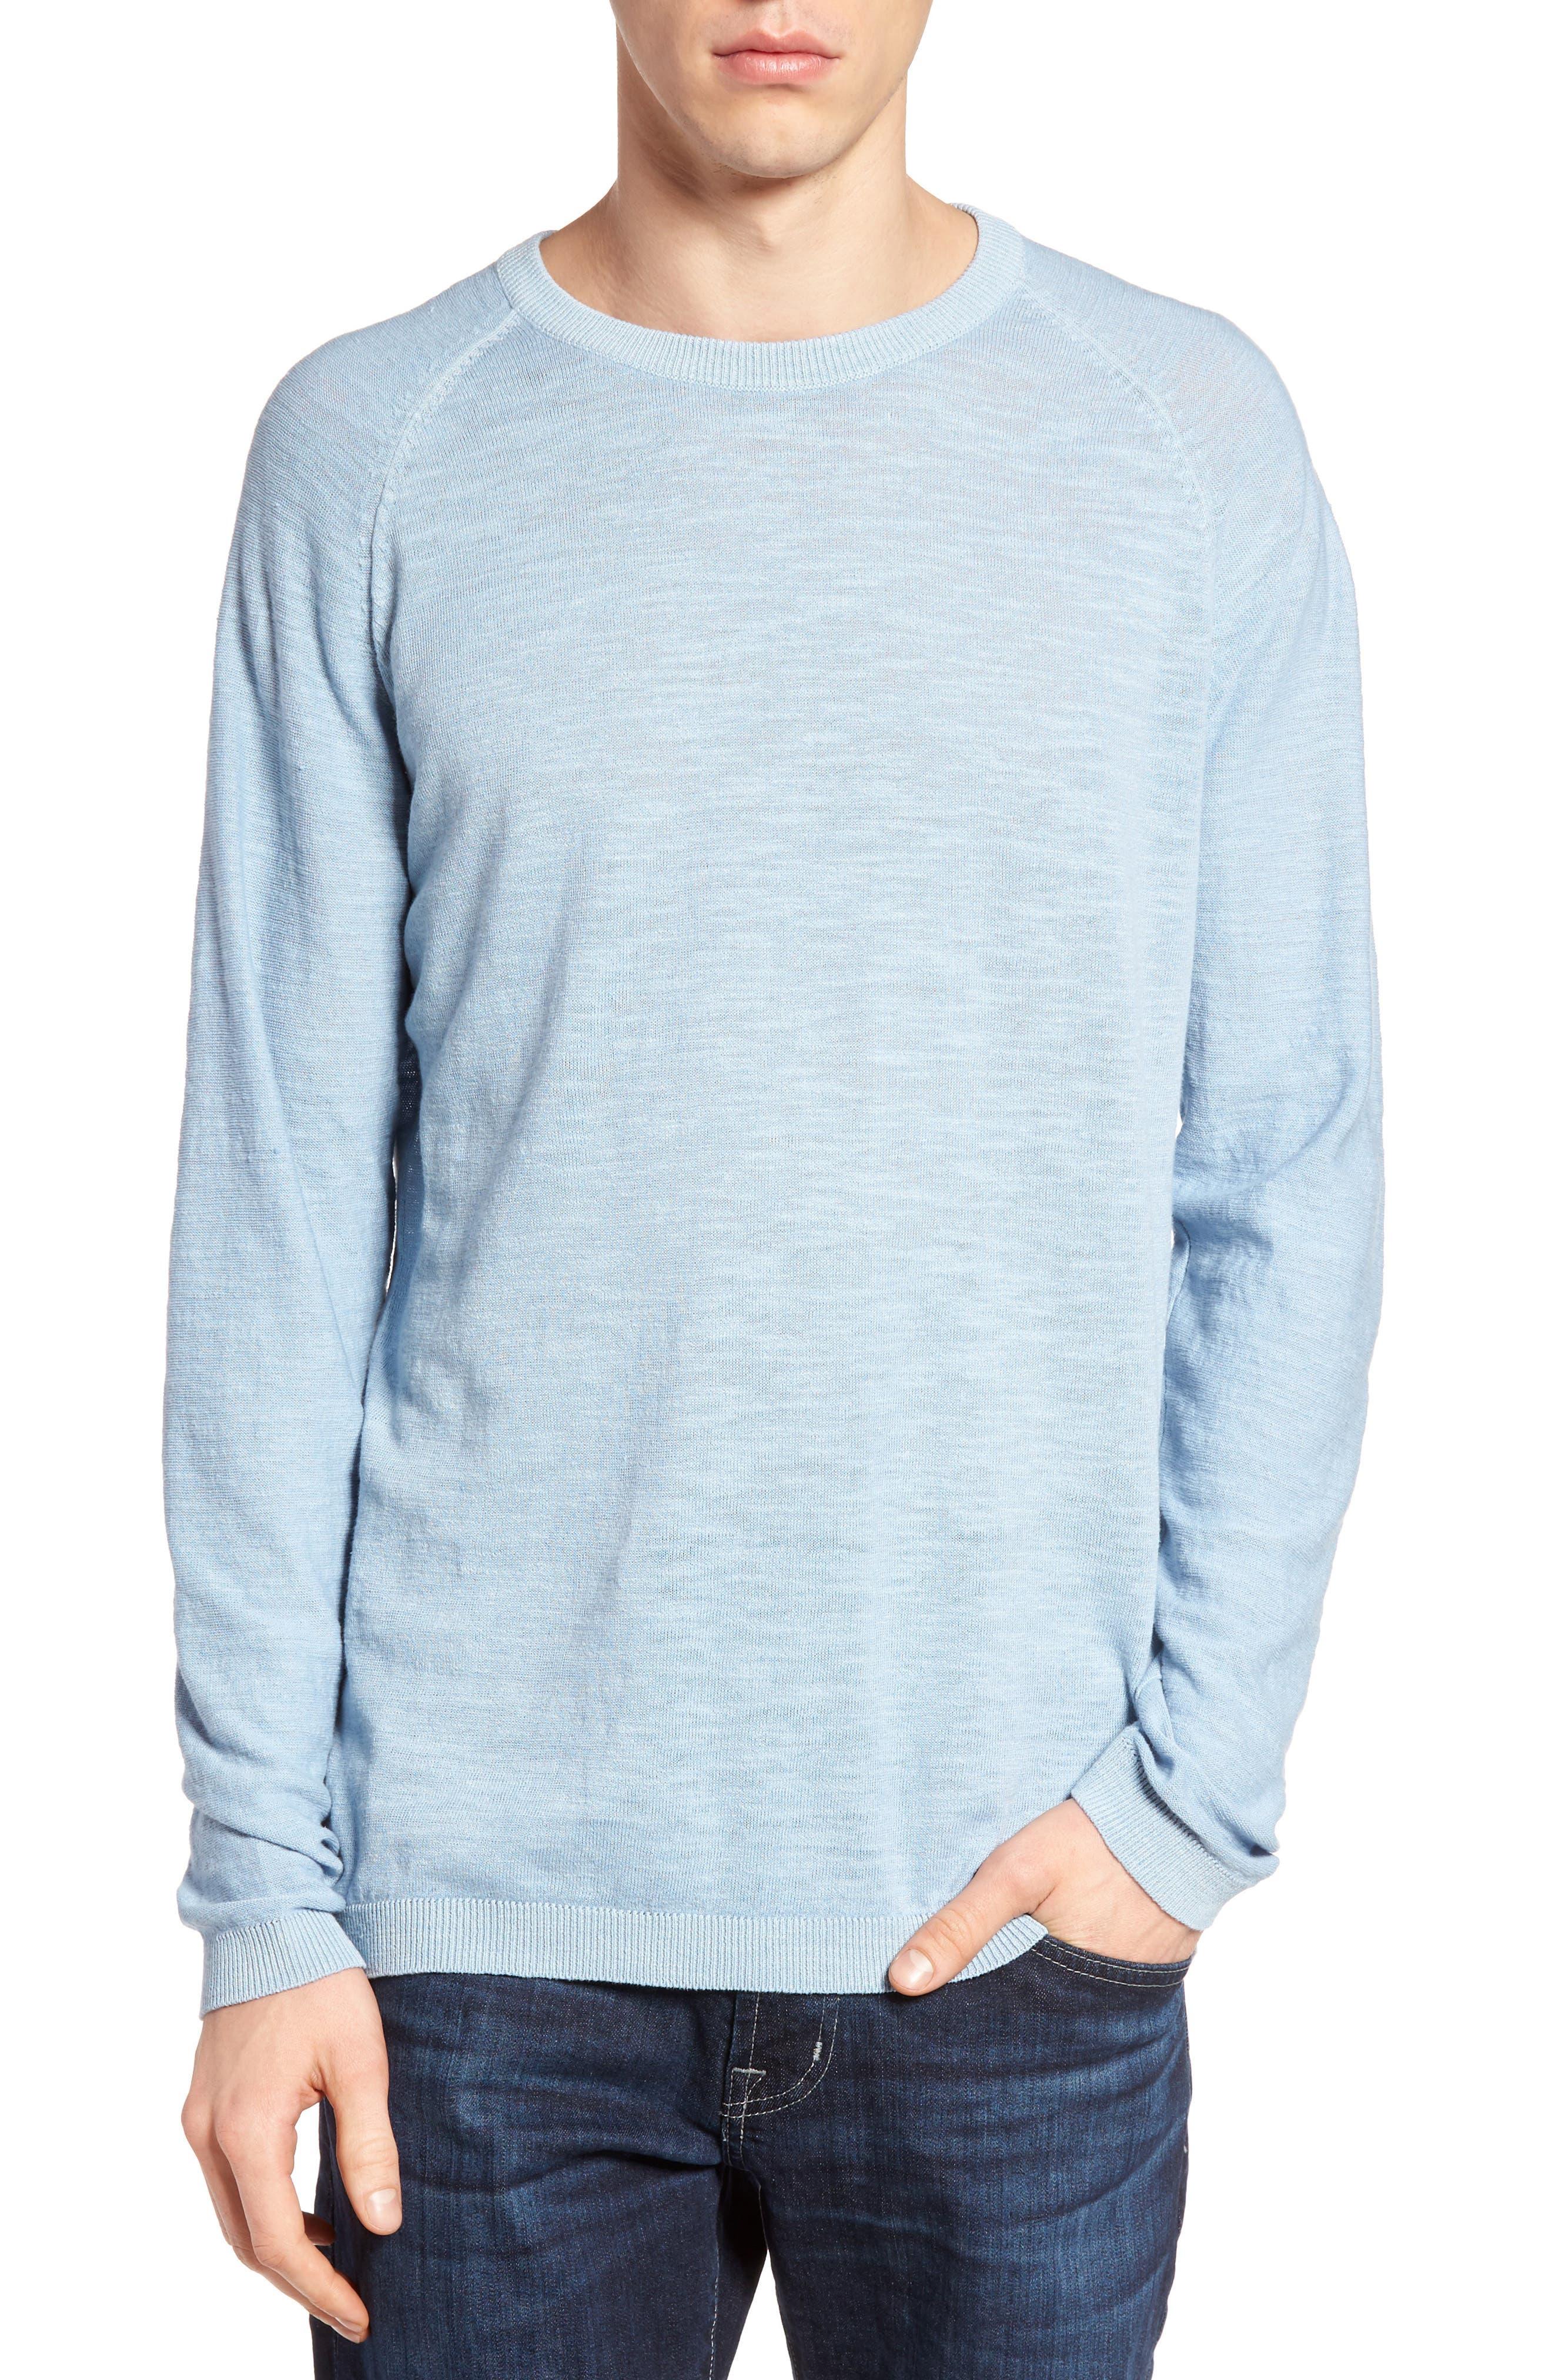 Arambol Cotton & Linen Sweater,                             Main thumbnail 1, color,                             Blue Lagoon